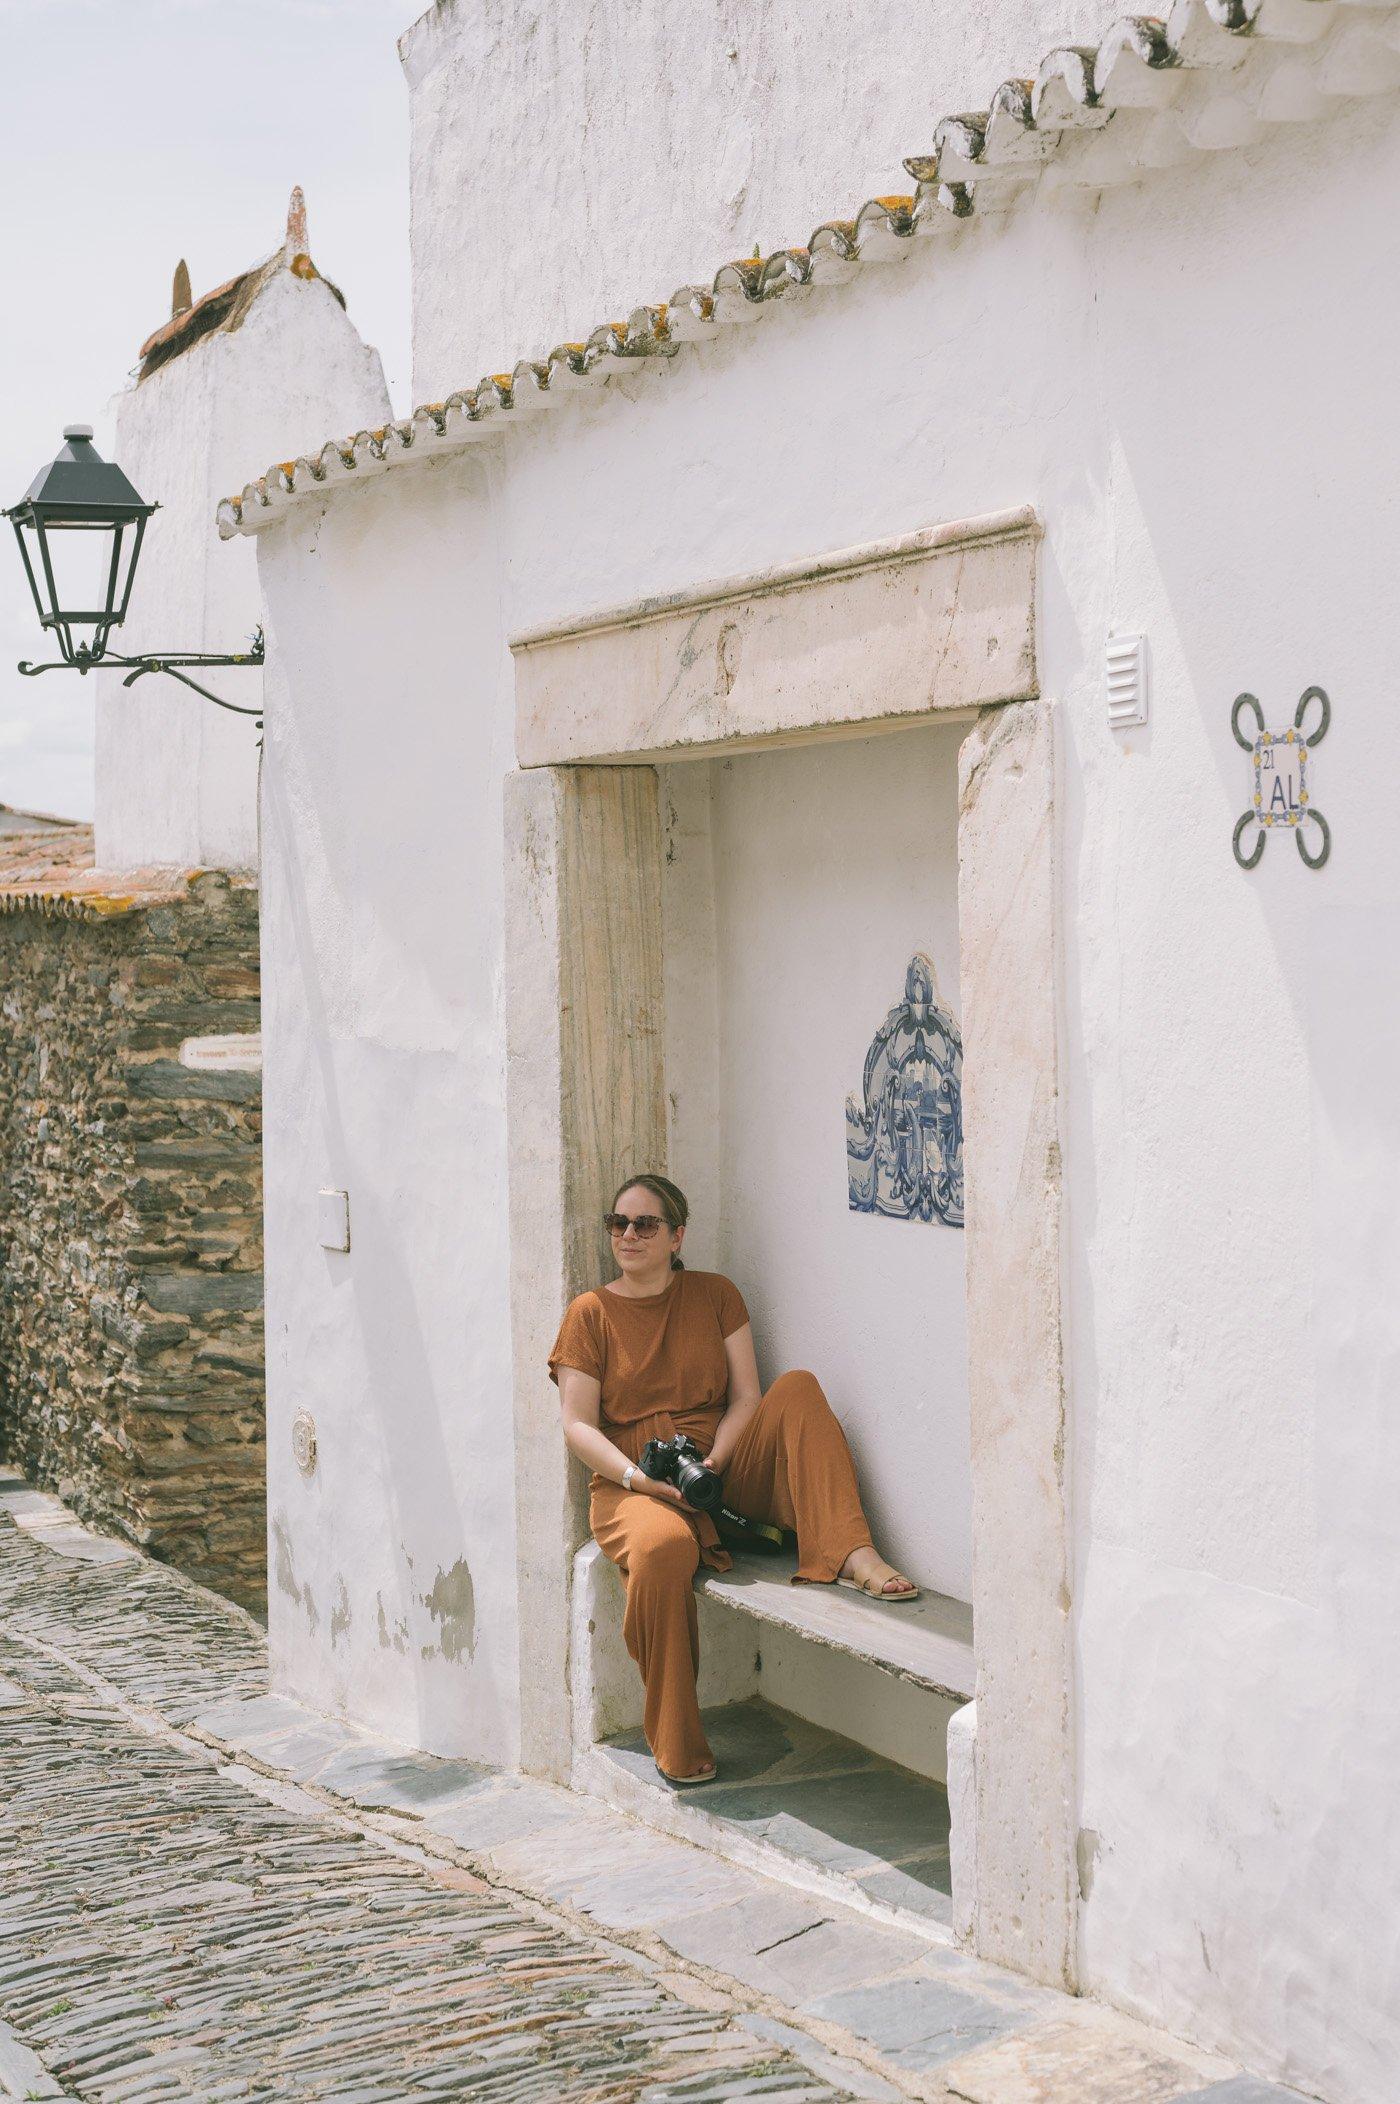 The whitewashed village of Monsaraz in Alentejo Portugal